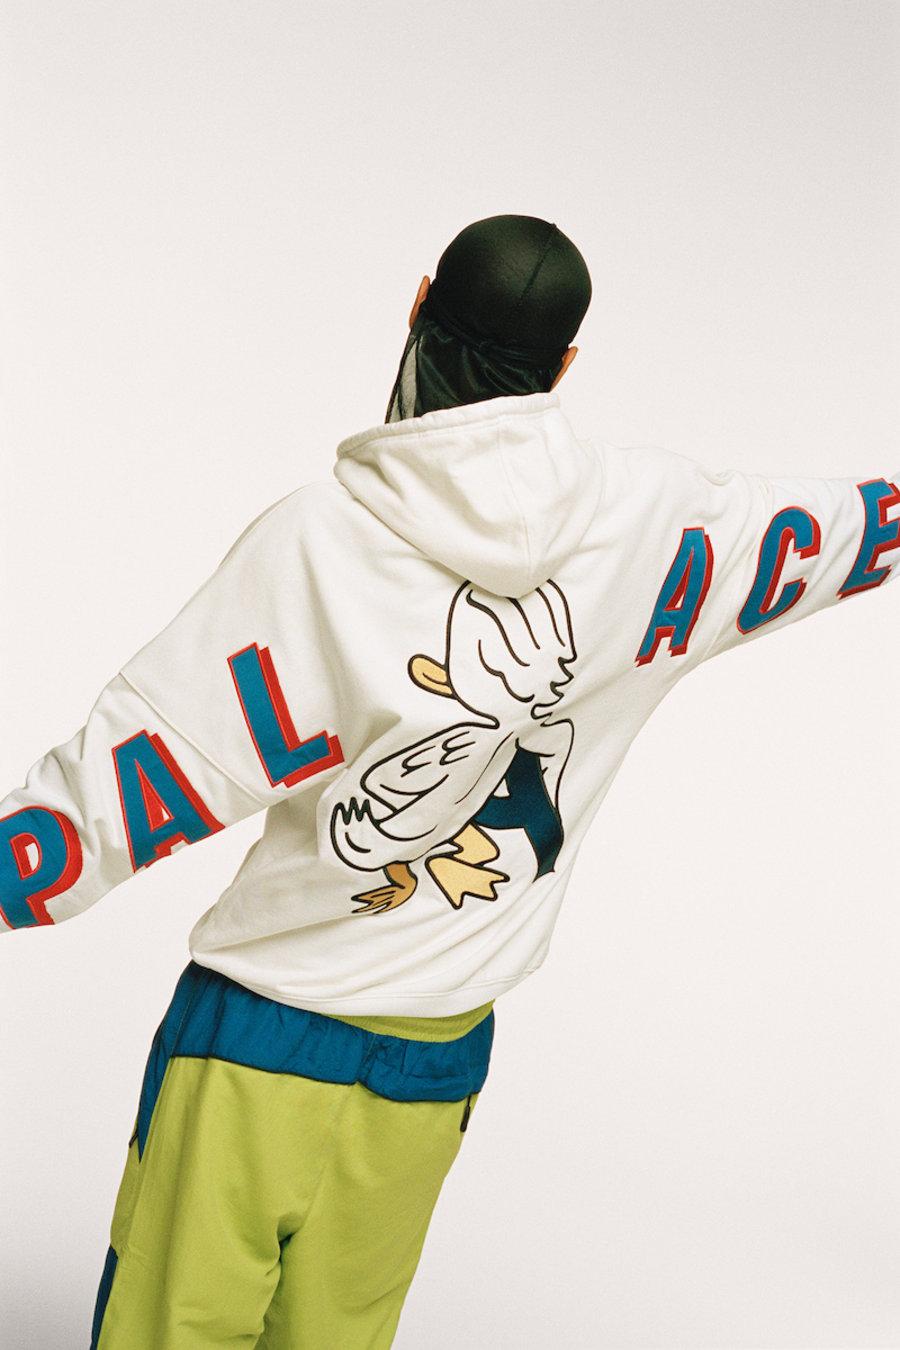 adidas,palace Palace 上海快闪店即将开幕!这次还有重磅联名和限定单品